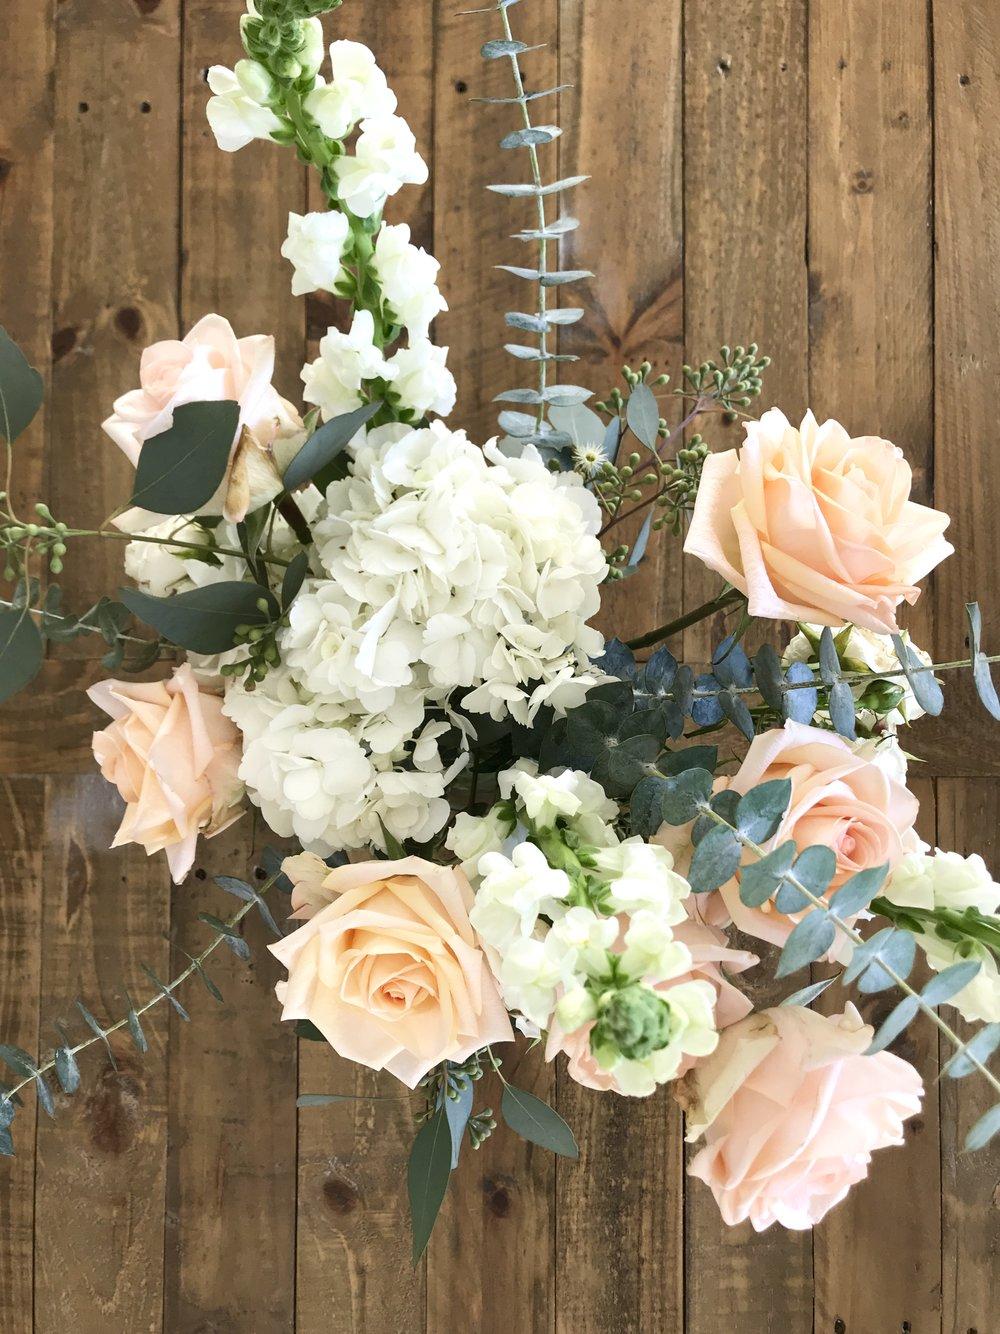 Simple Joys: Fresh Flowers and Stillness